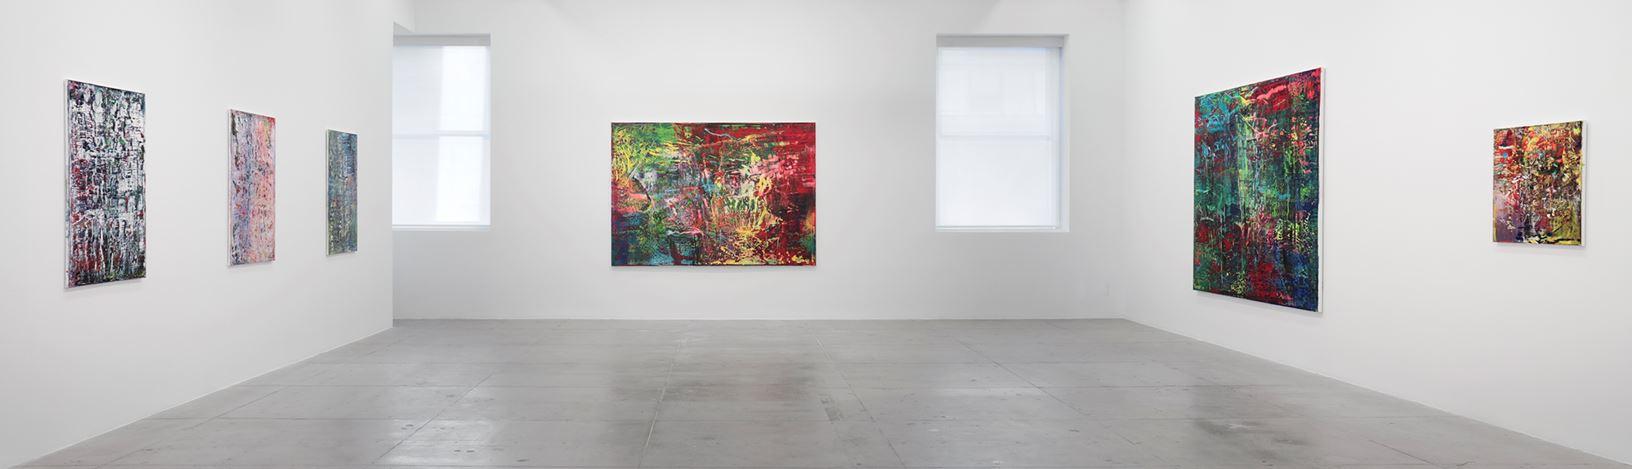 Exhibition view: Gerhard Richter, Marian Goodman Gallery, New York (28 February–24 July 2020). Courtesy Marian Goodman Gallery.